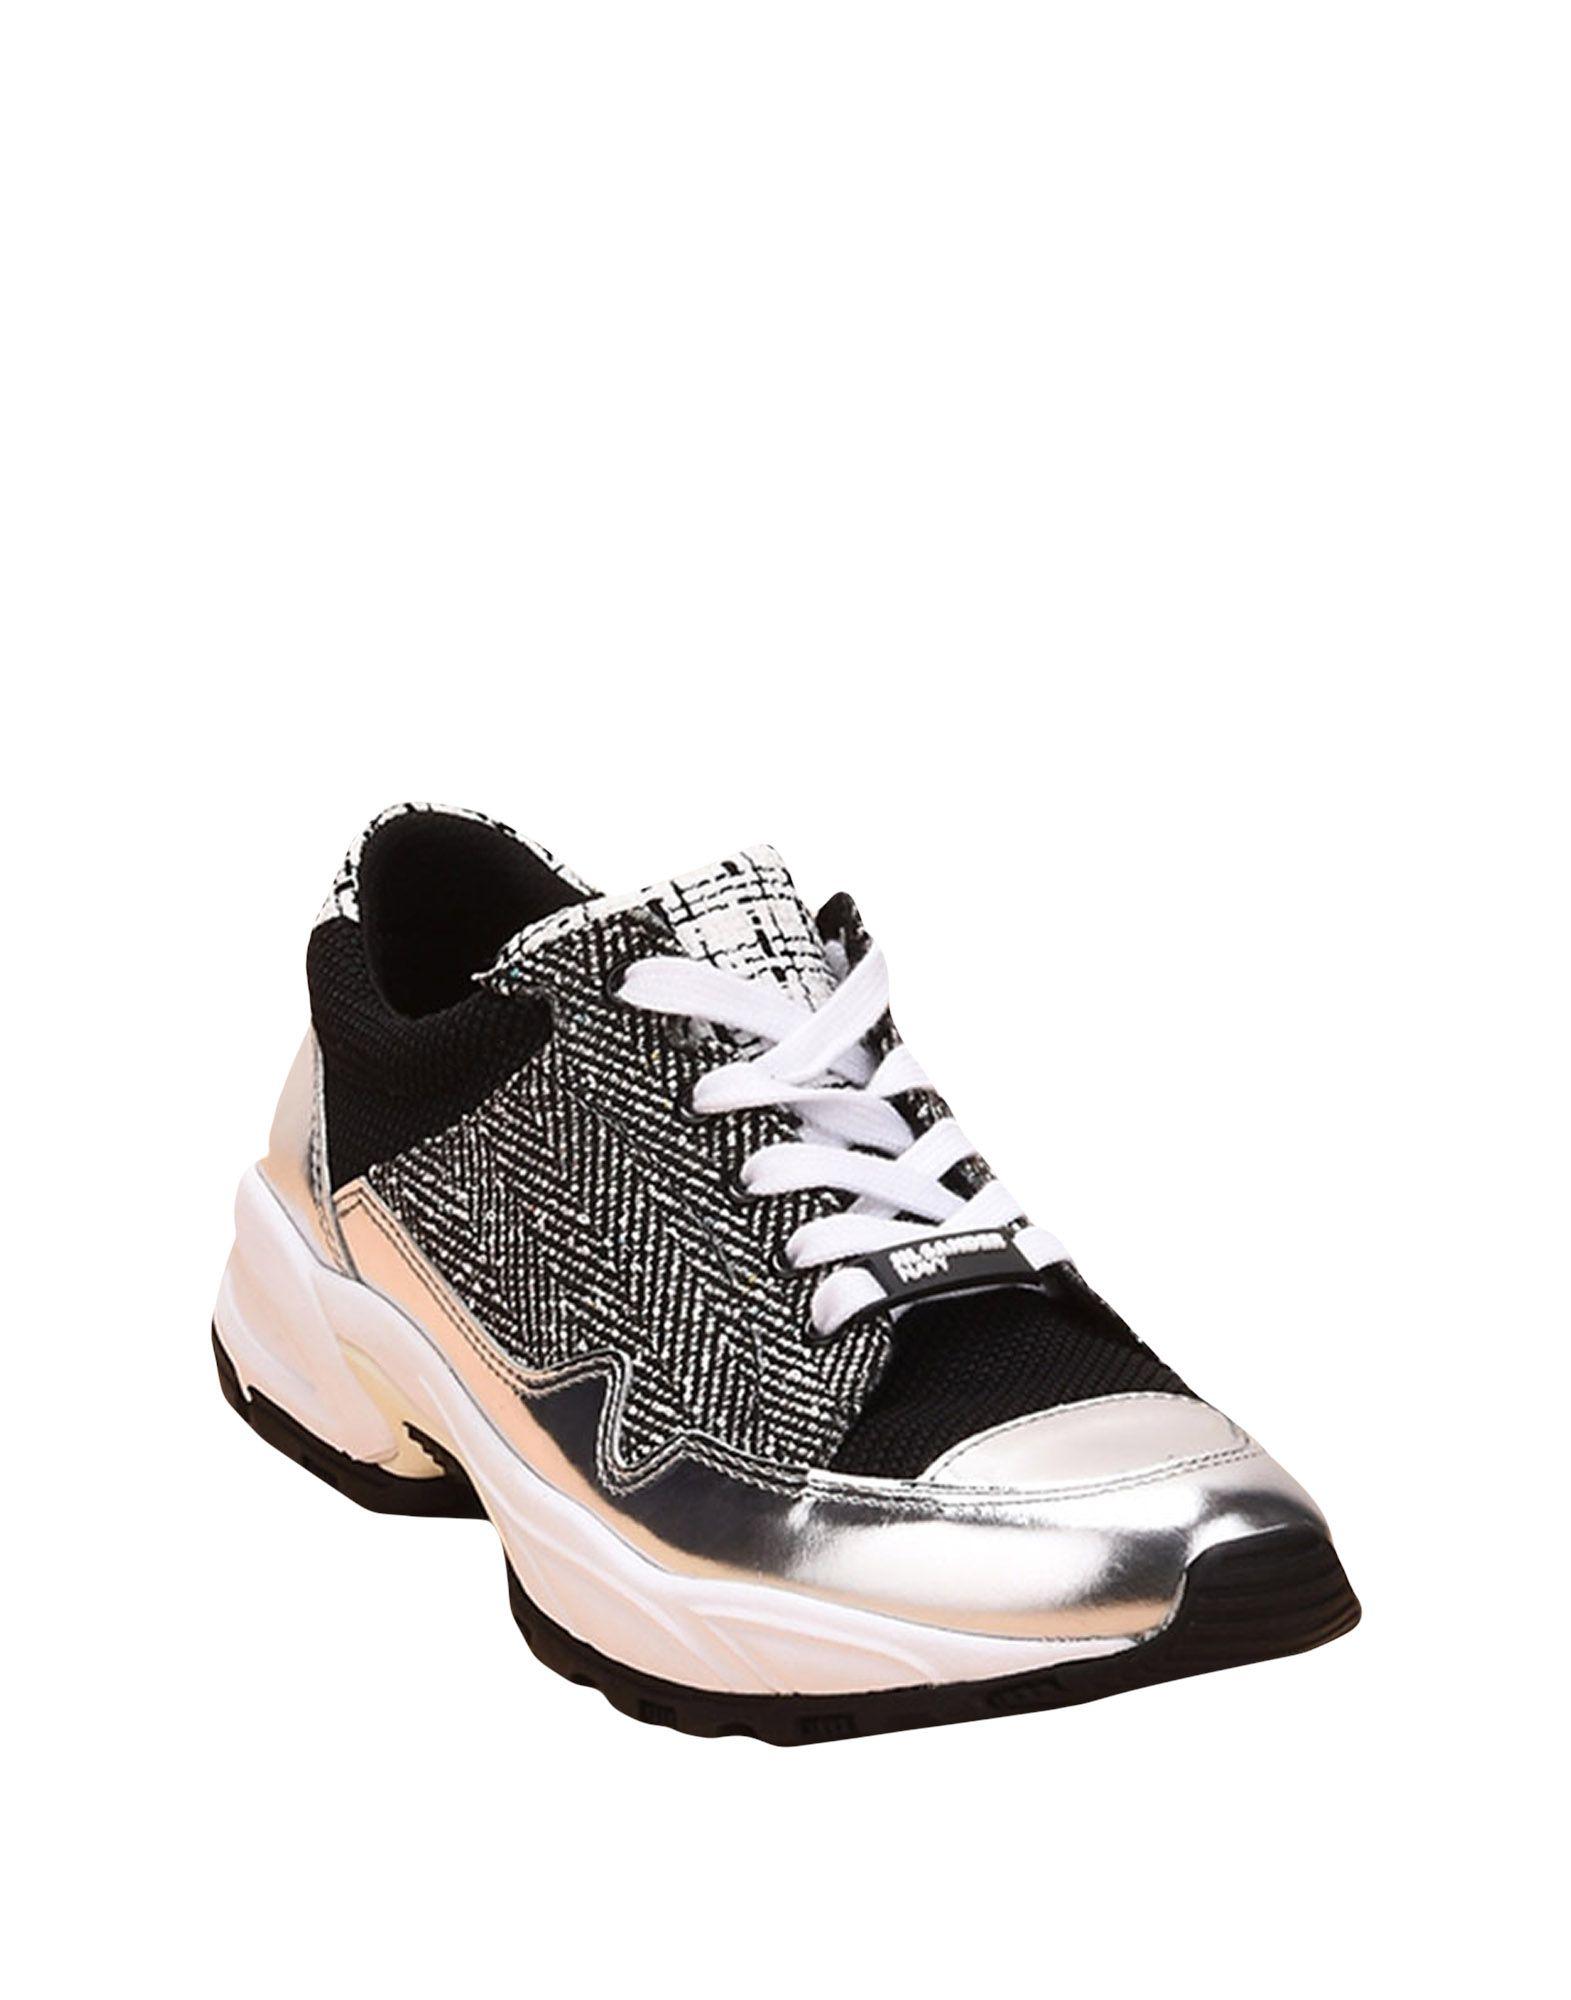 Jil Sander Navy Sneakers - Women Jil Sander Navy Australia Sneakers online on  Australia Navy - 11518293JQ cee21f